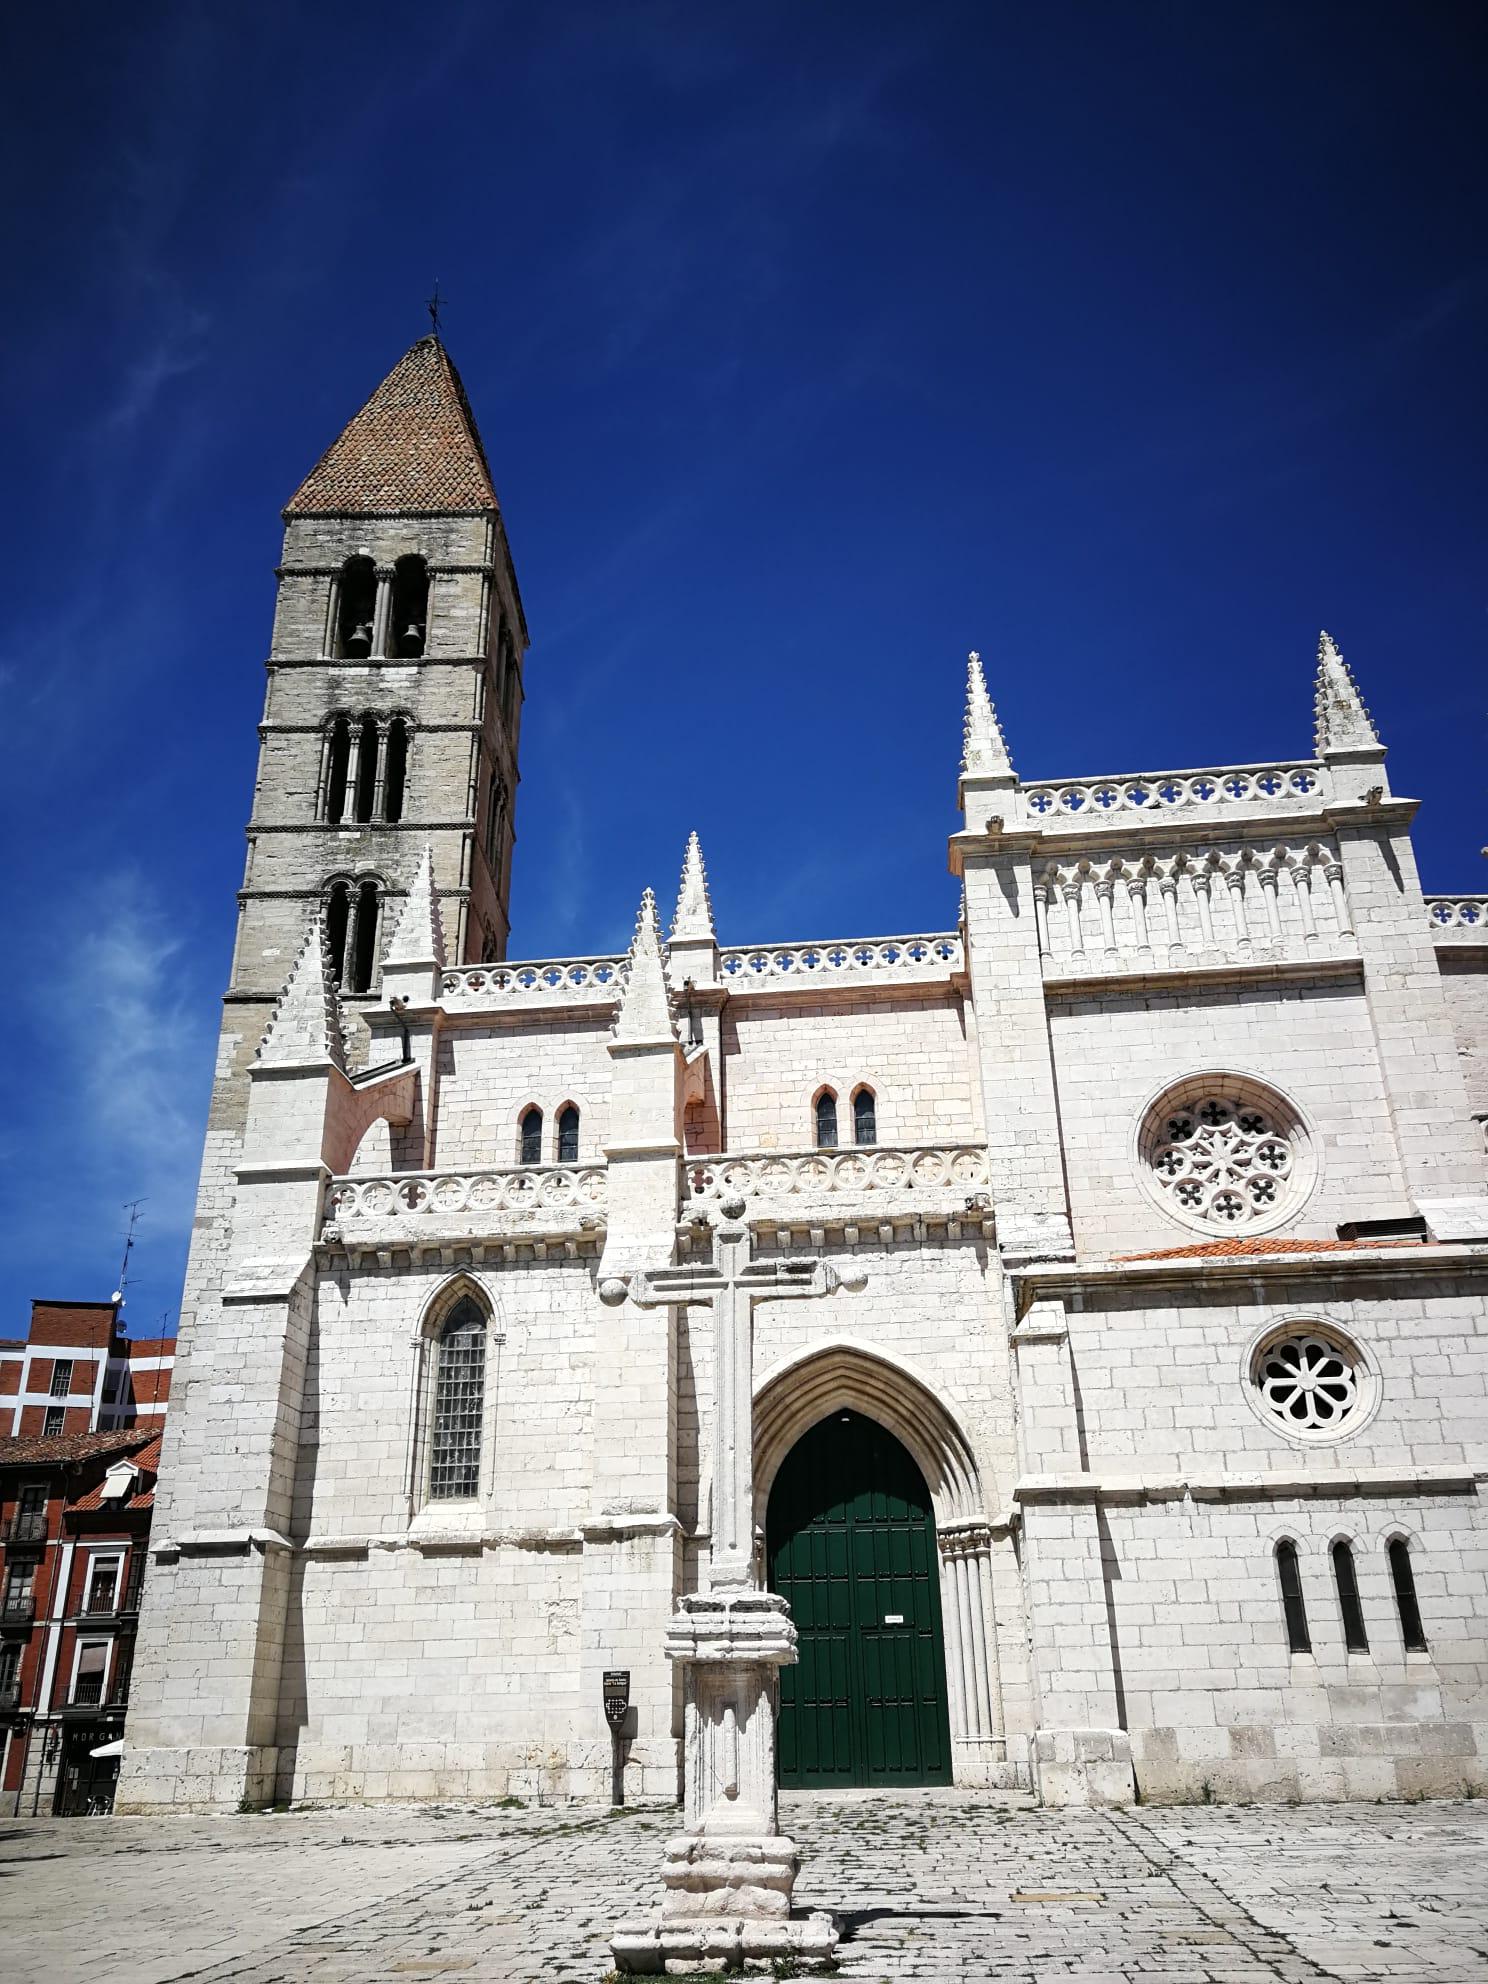 La iglesia de Santa María La Antigua